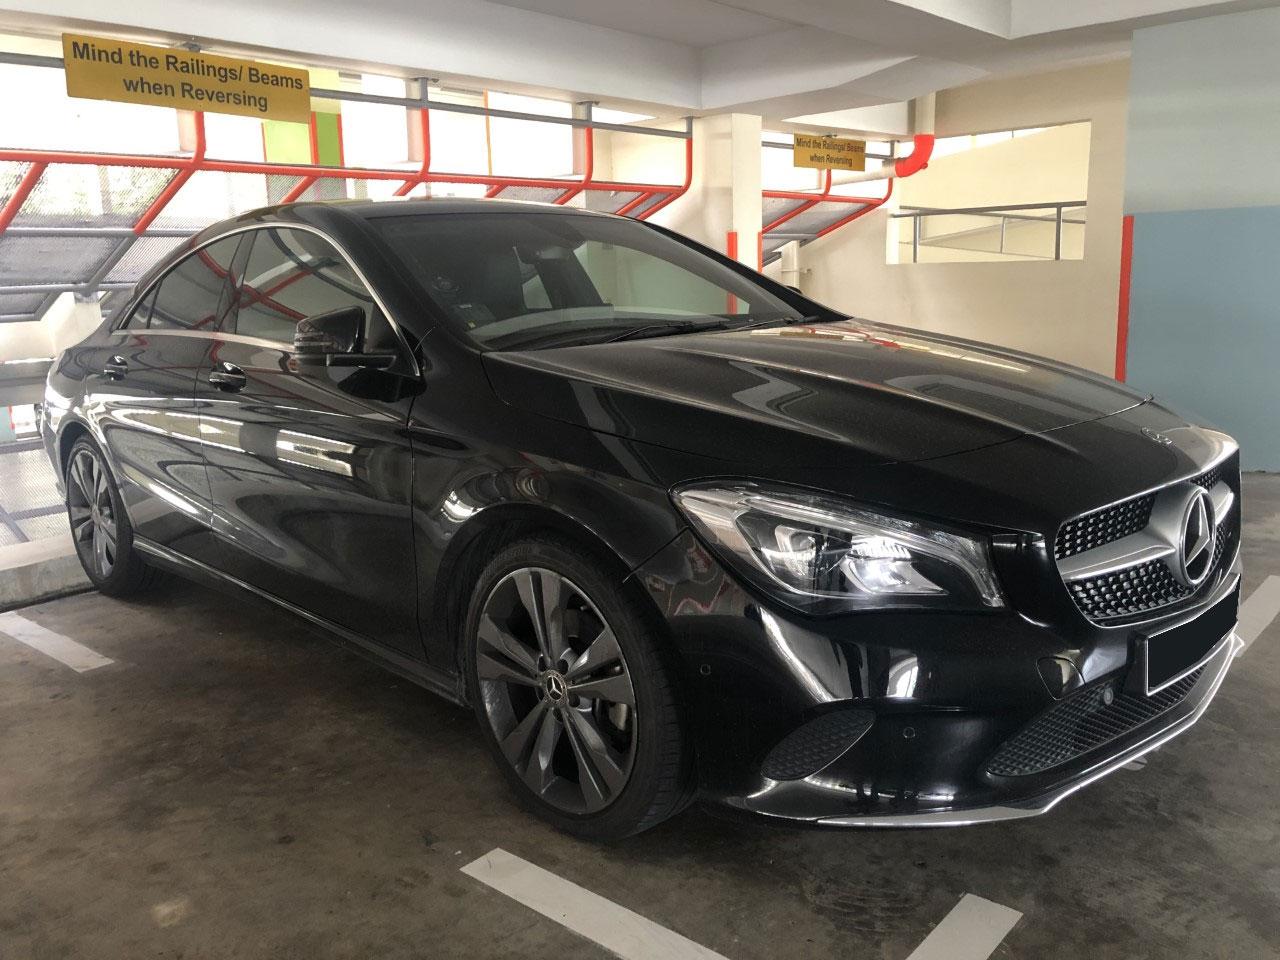 Mercedes-Benz CLA Class CLA-200 (For Lease)